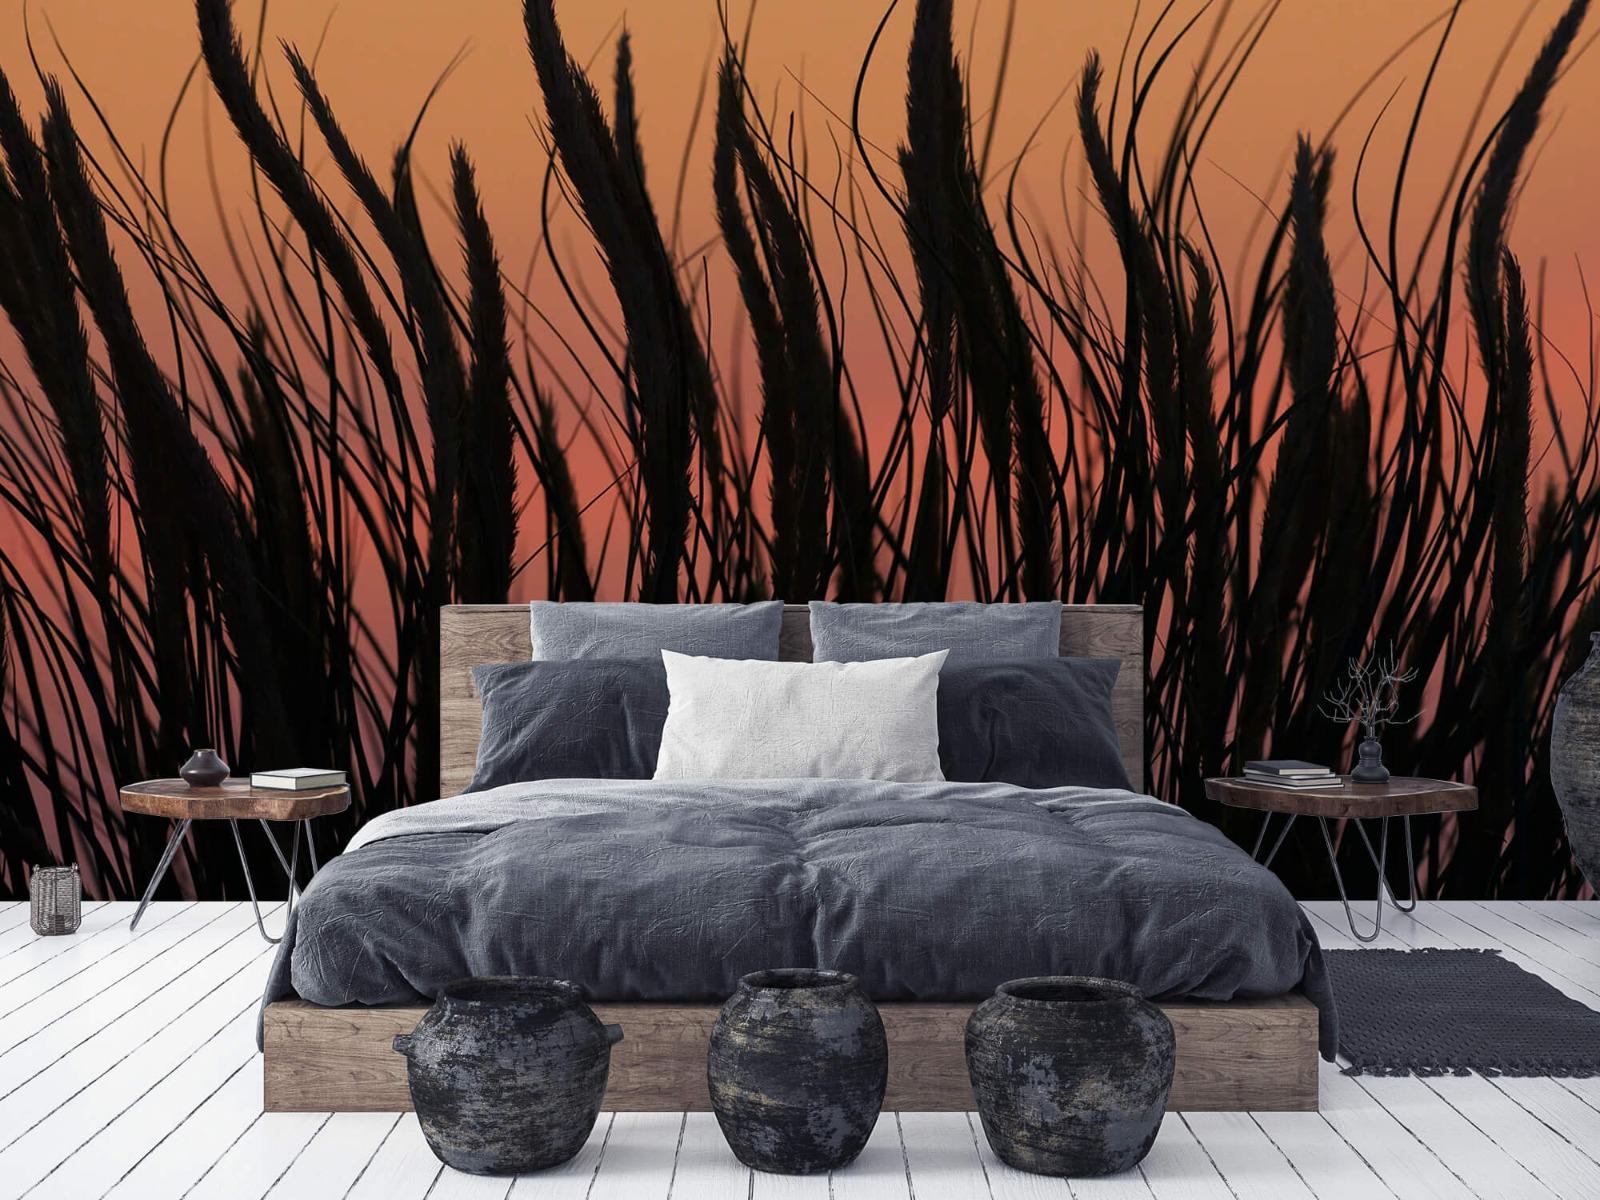 Zomer behang - Helmgras in de avond - Slaapkamer 2